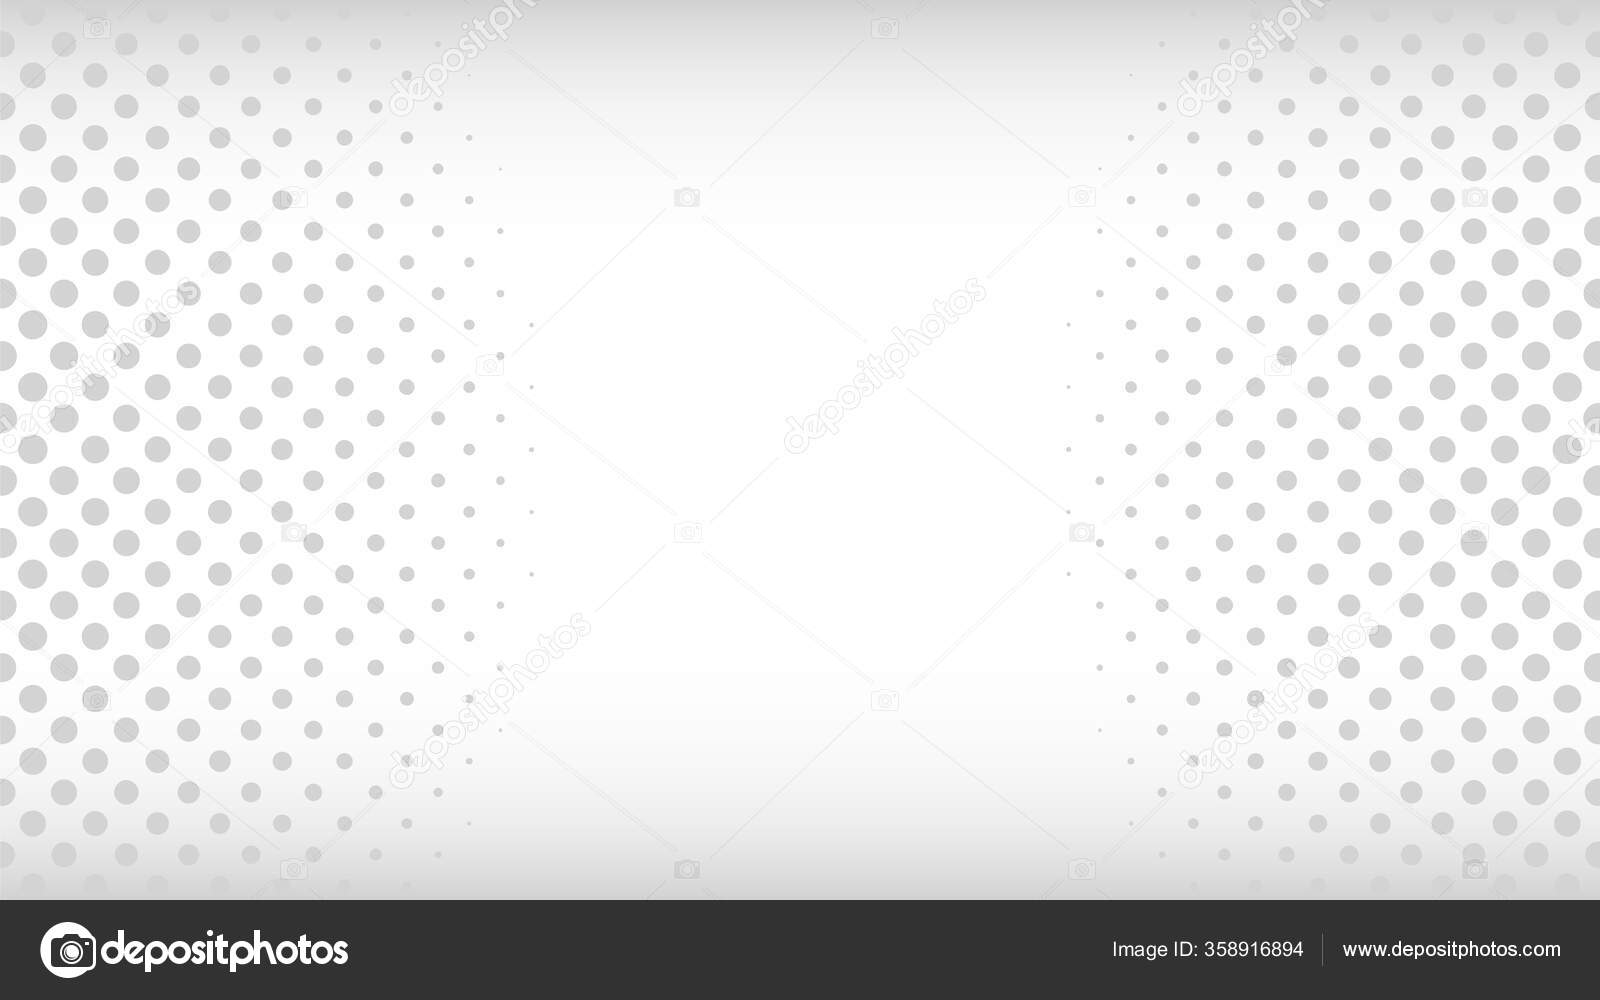 r u00e9sum u00e9 halftone blanche contexte gris gris dessin arri u00e8re plan dot  u2014 image vectorielle